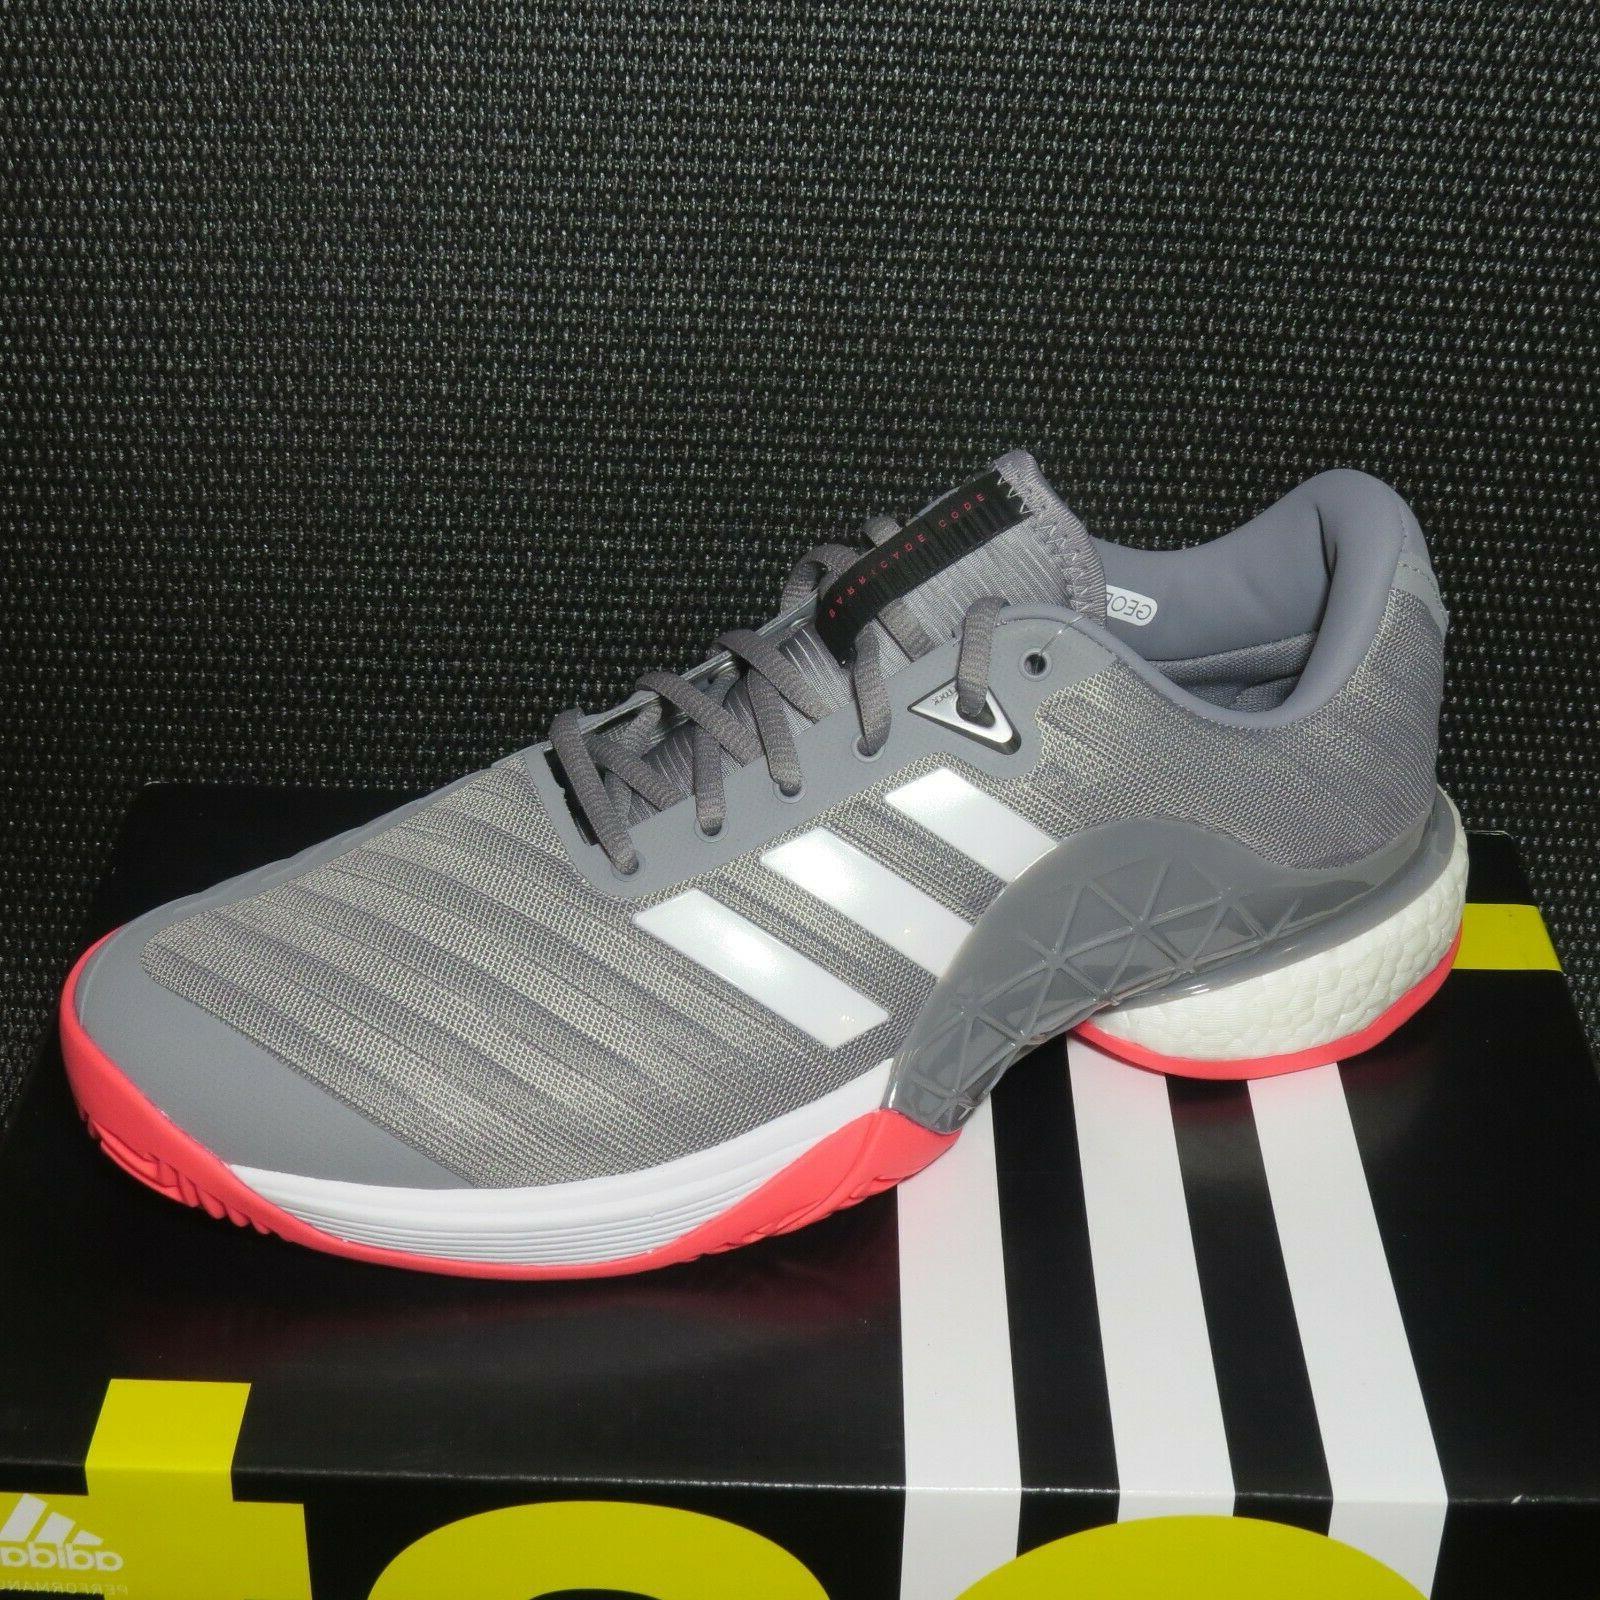 adidas Barricade AH2094 Size 12 Mens Tennis Shoes